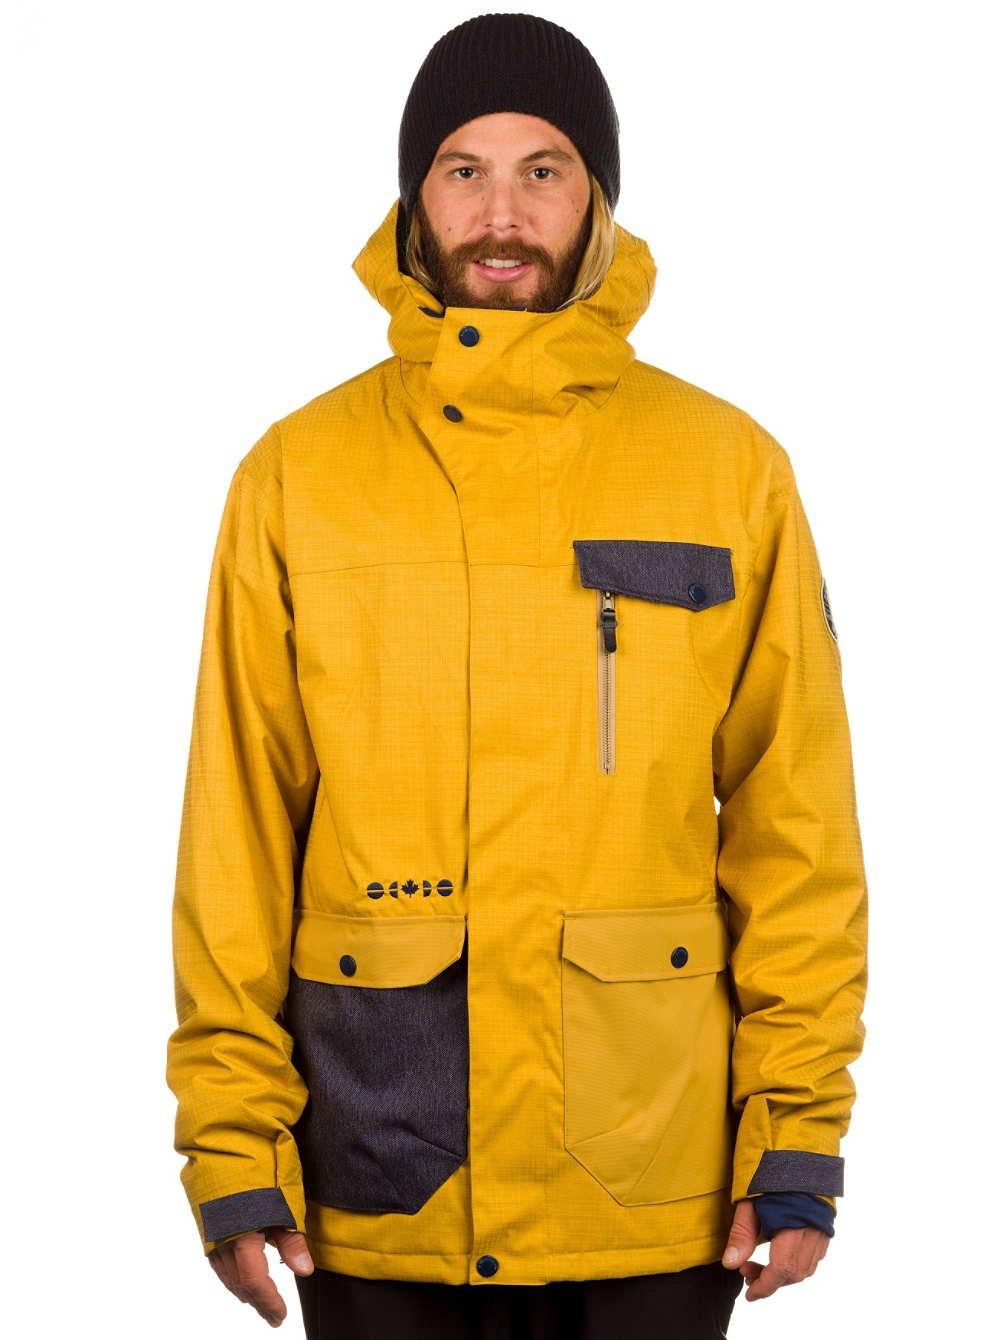 Giacca Snowboard da uomo West Beach Utopia Jacket